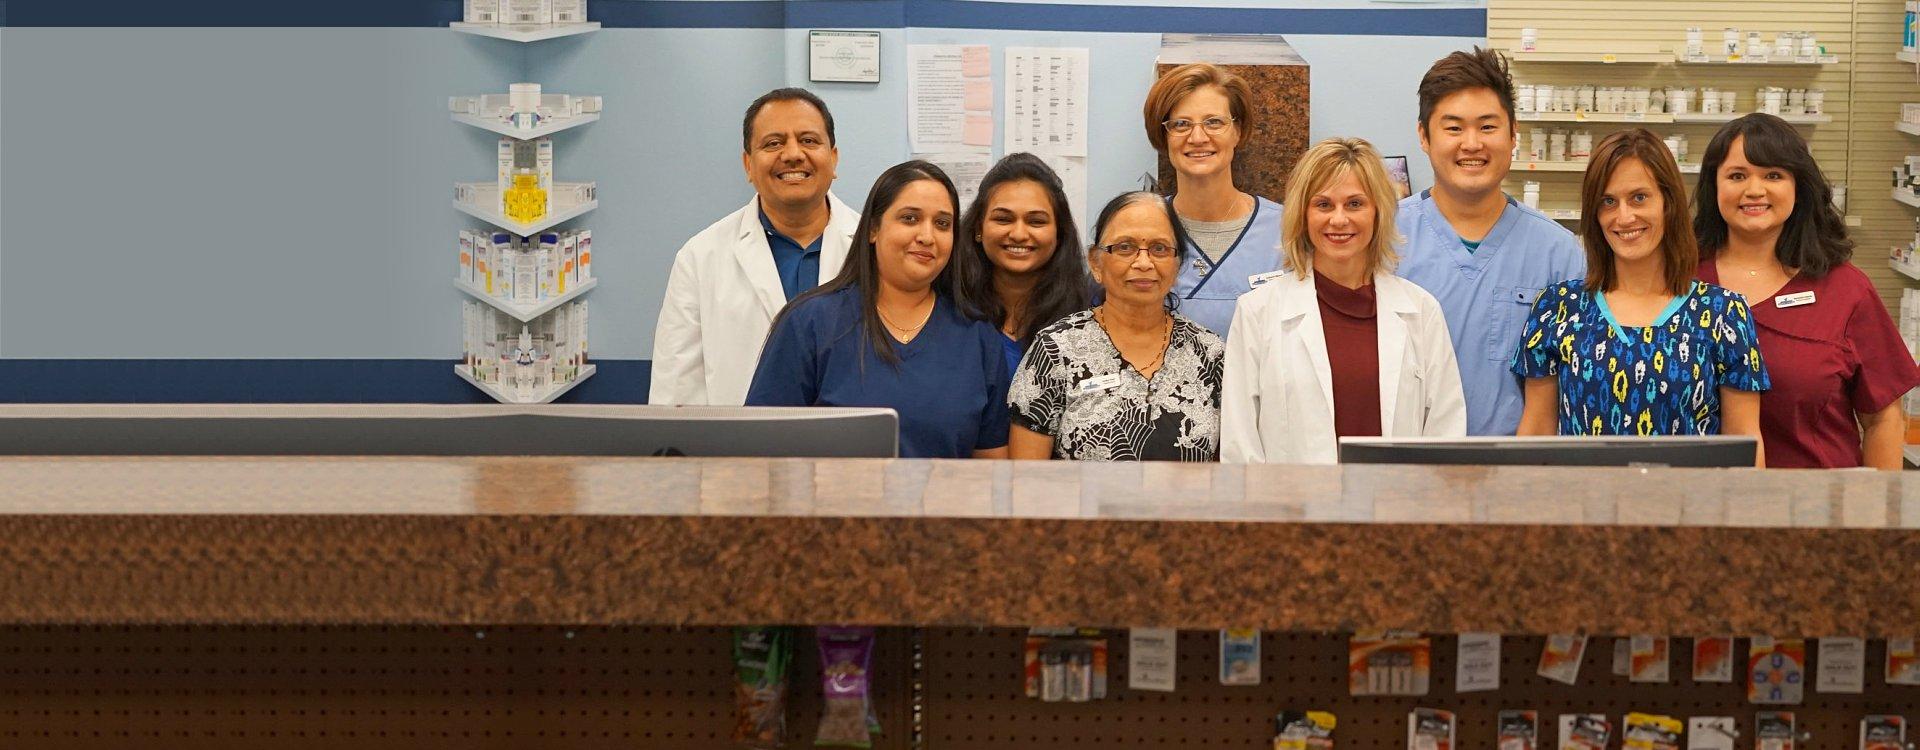 Long Prairie pharmacists